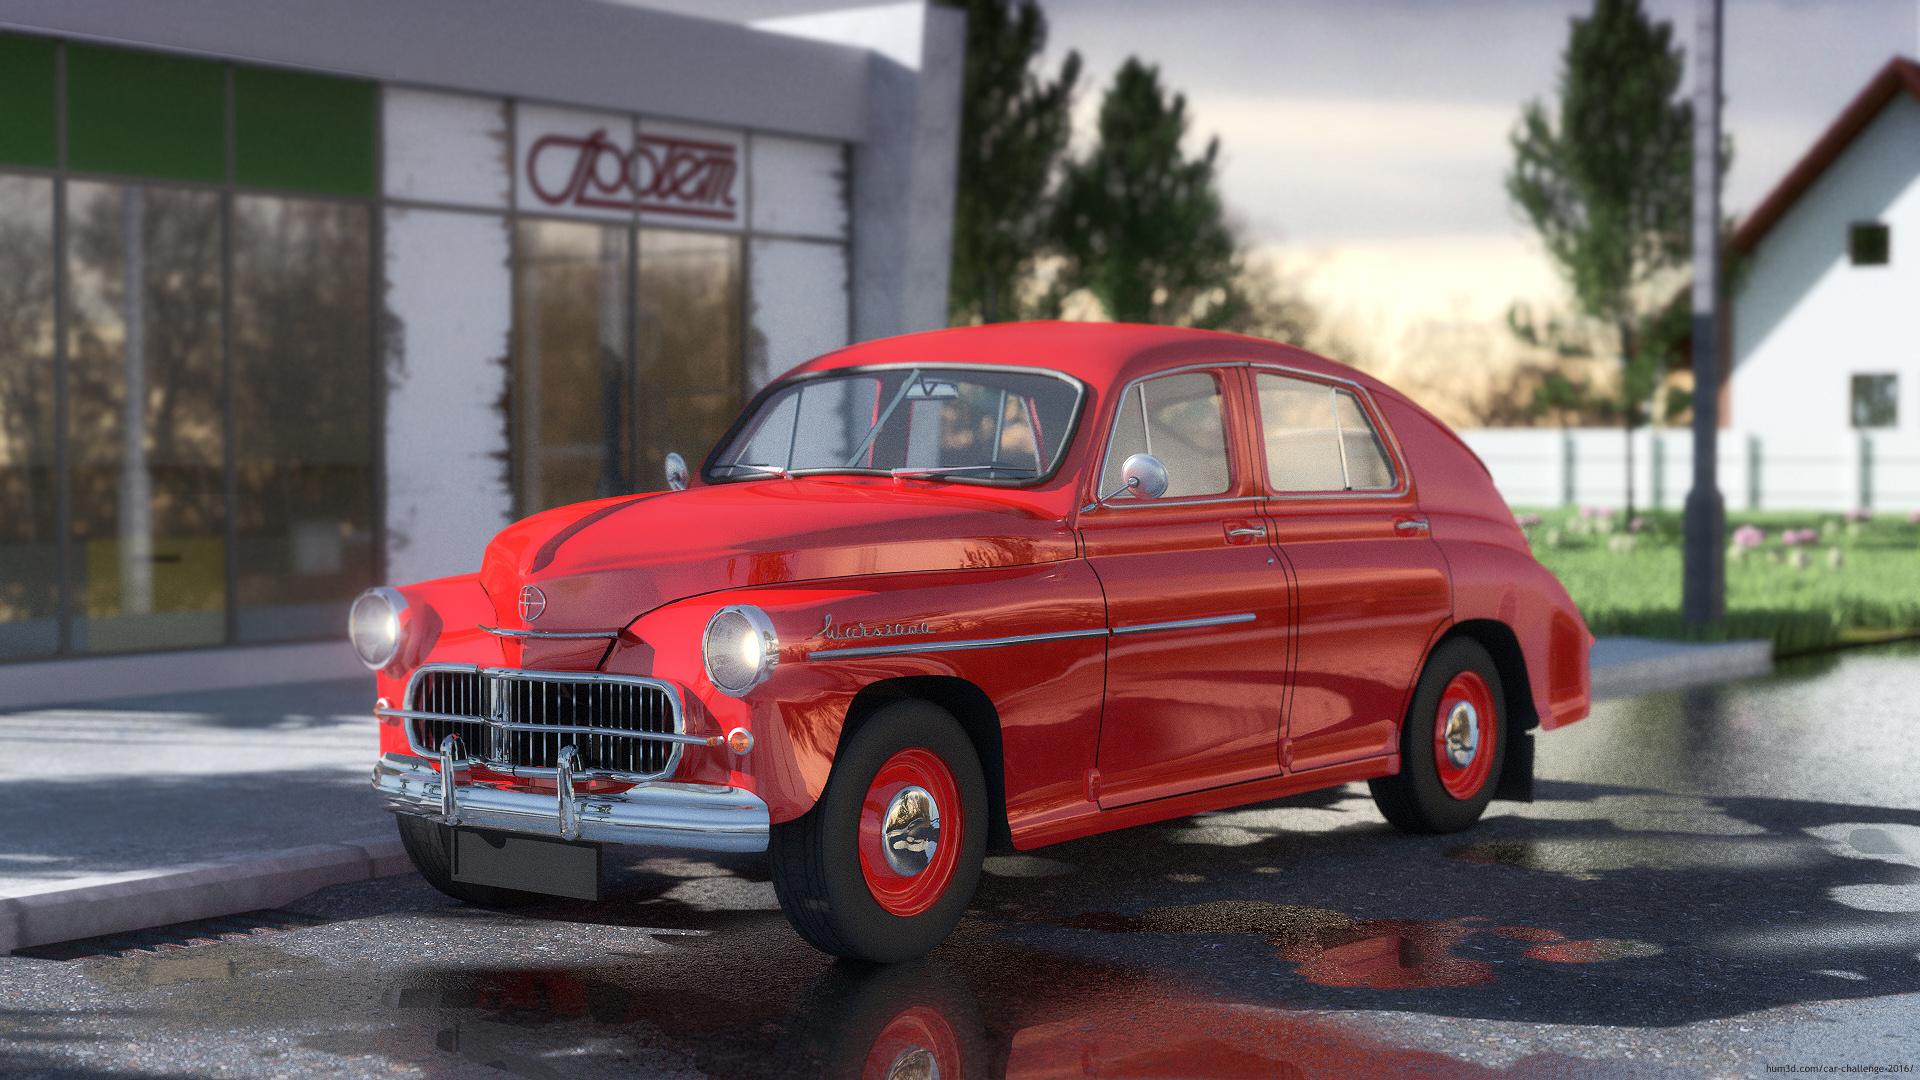 A dignitary's car 3d art